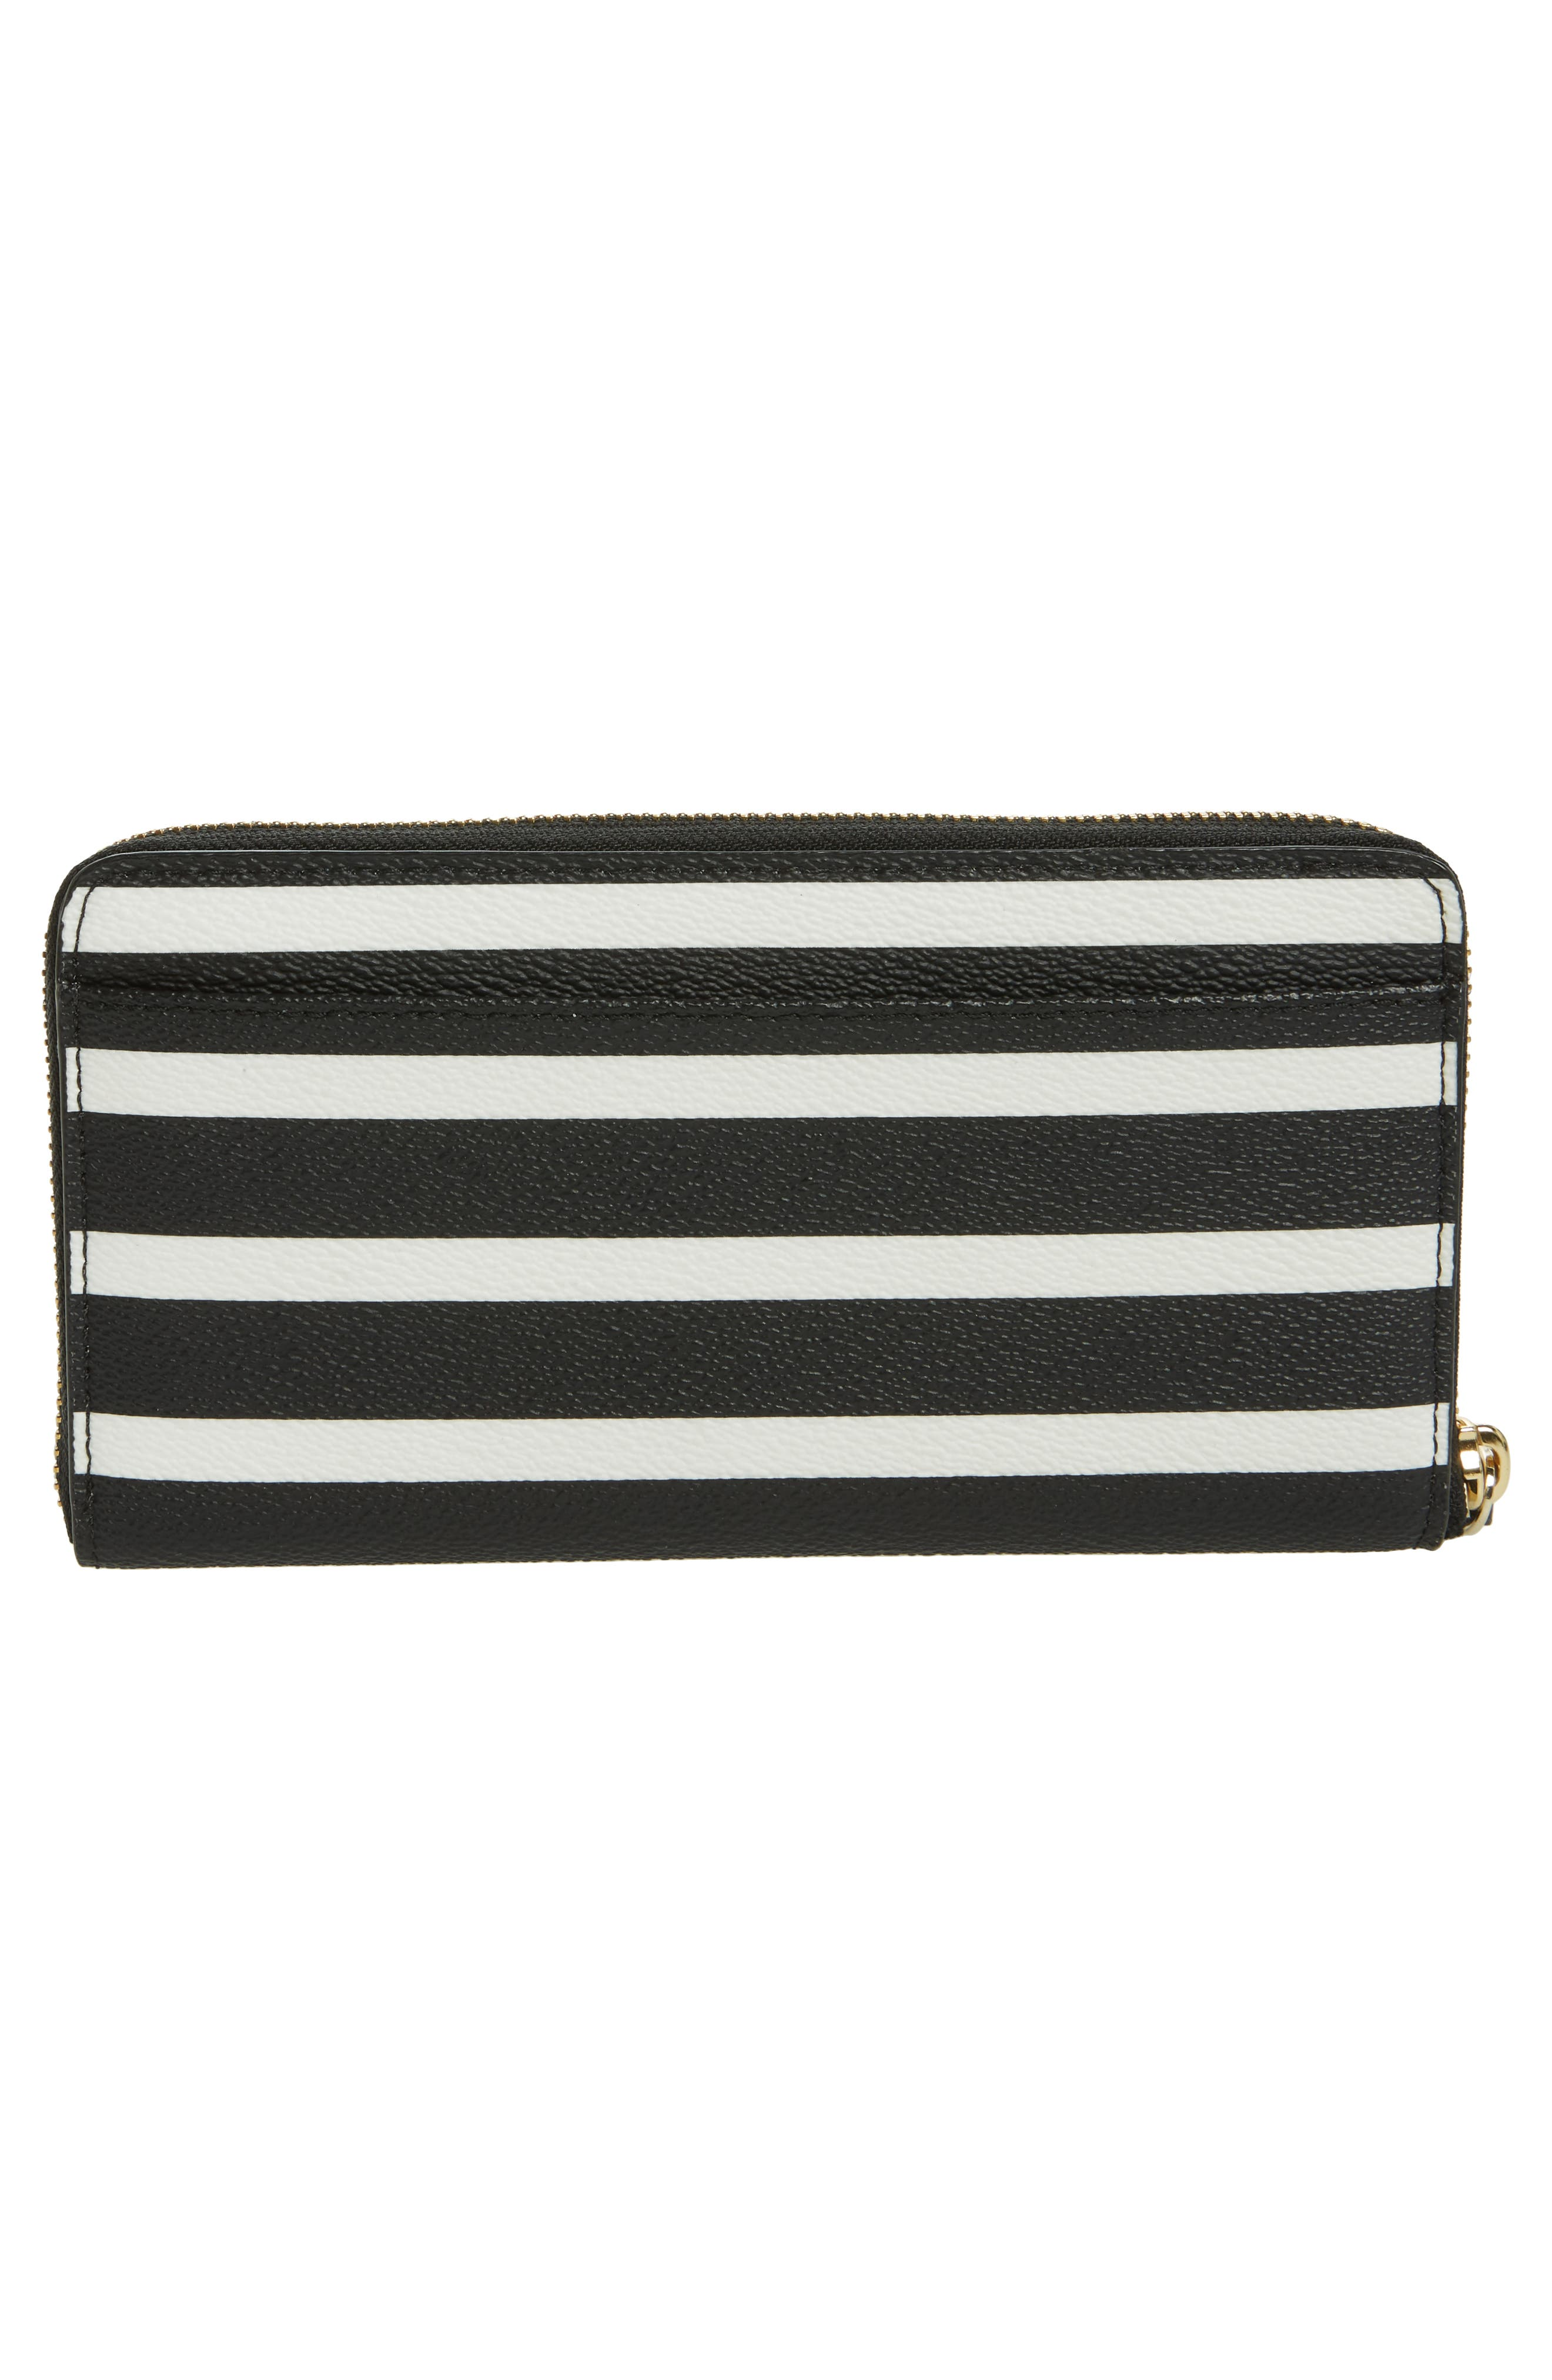 hyde lane - michele stripe wallet,                             Alternate thumbnail 3, color,                             Black/ Cream